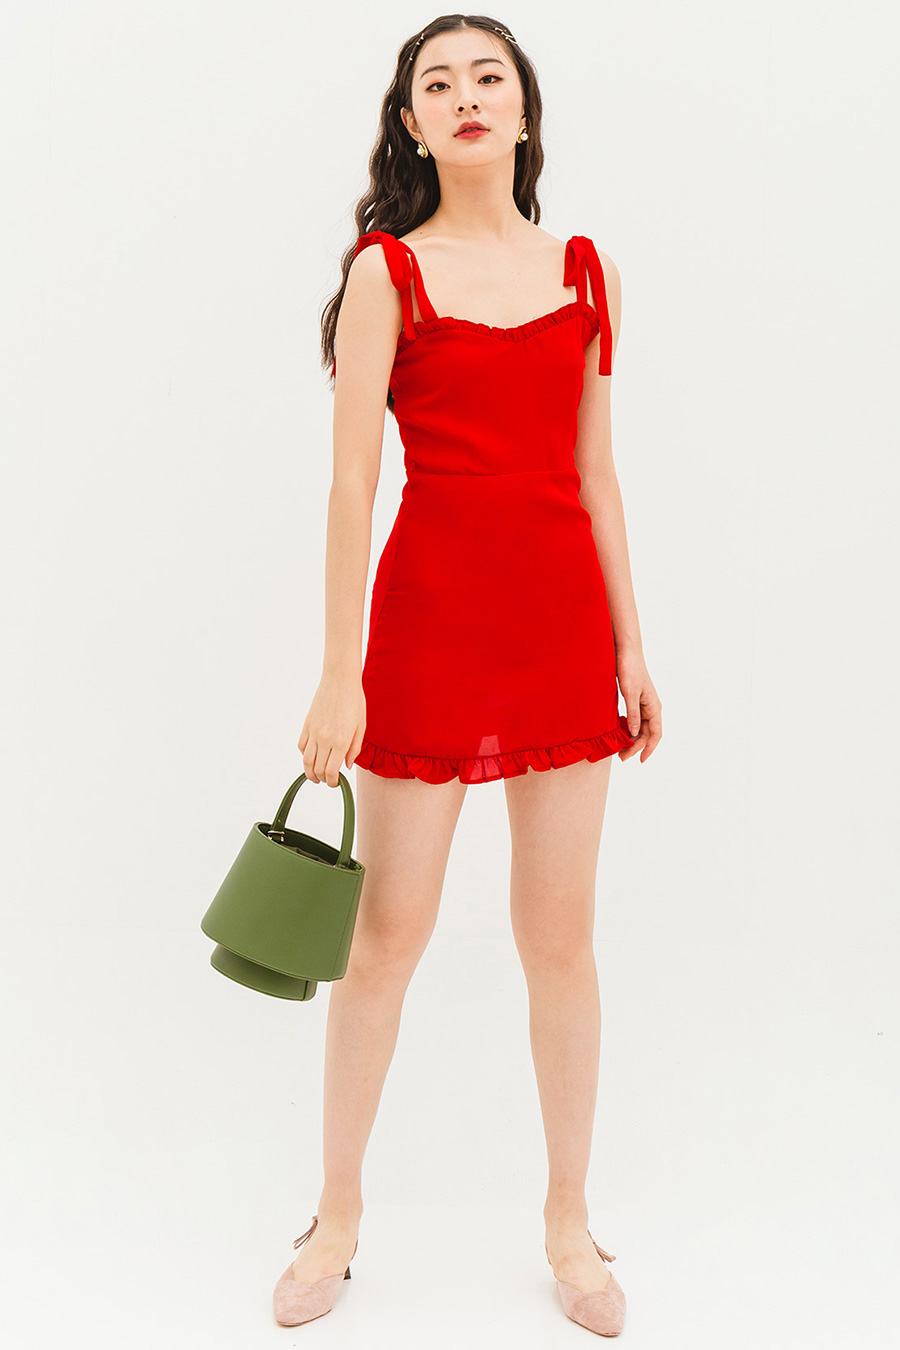 GRANITA DRESS - SCARLET